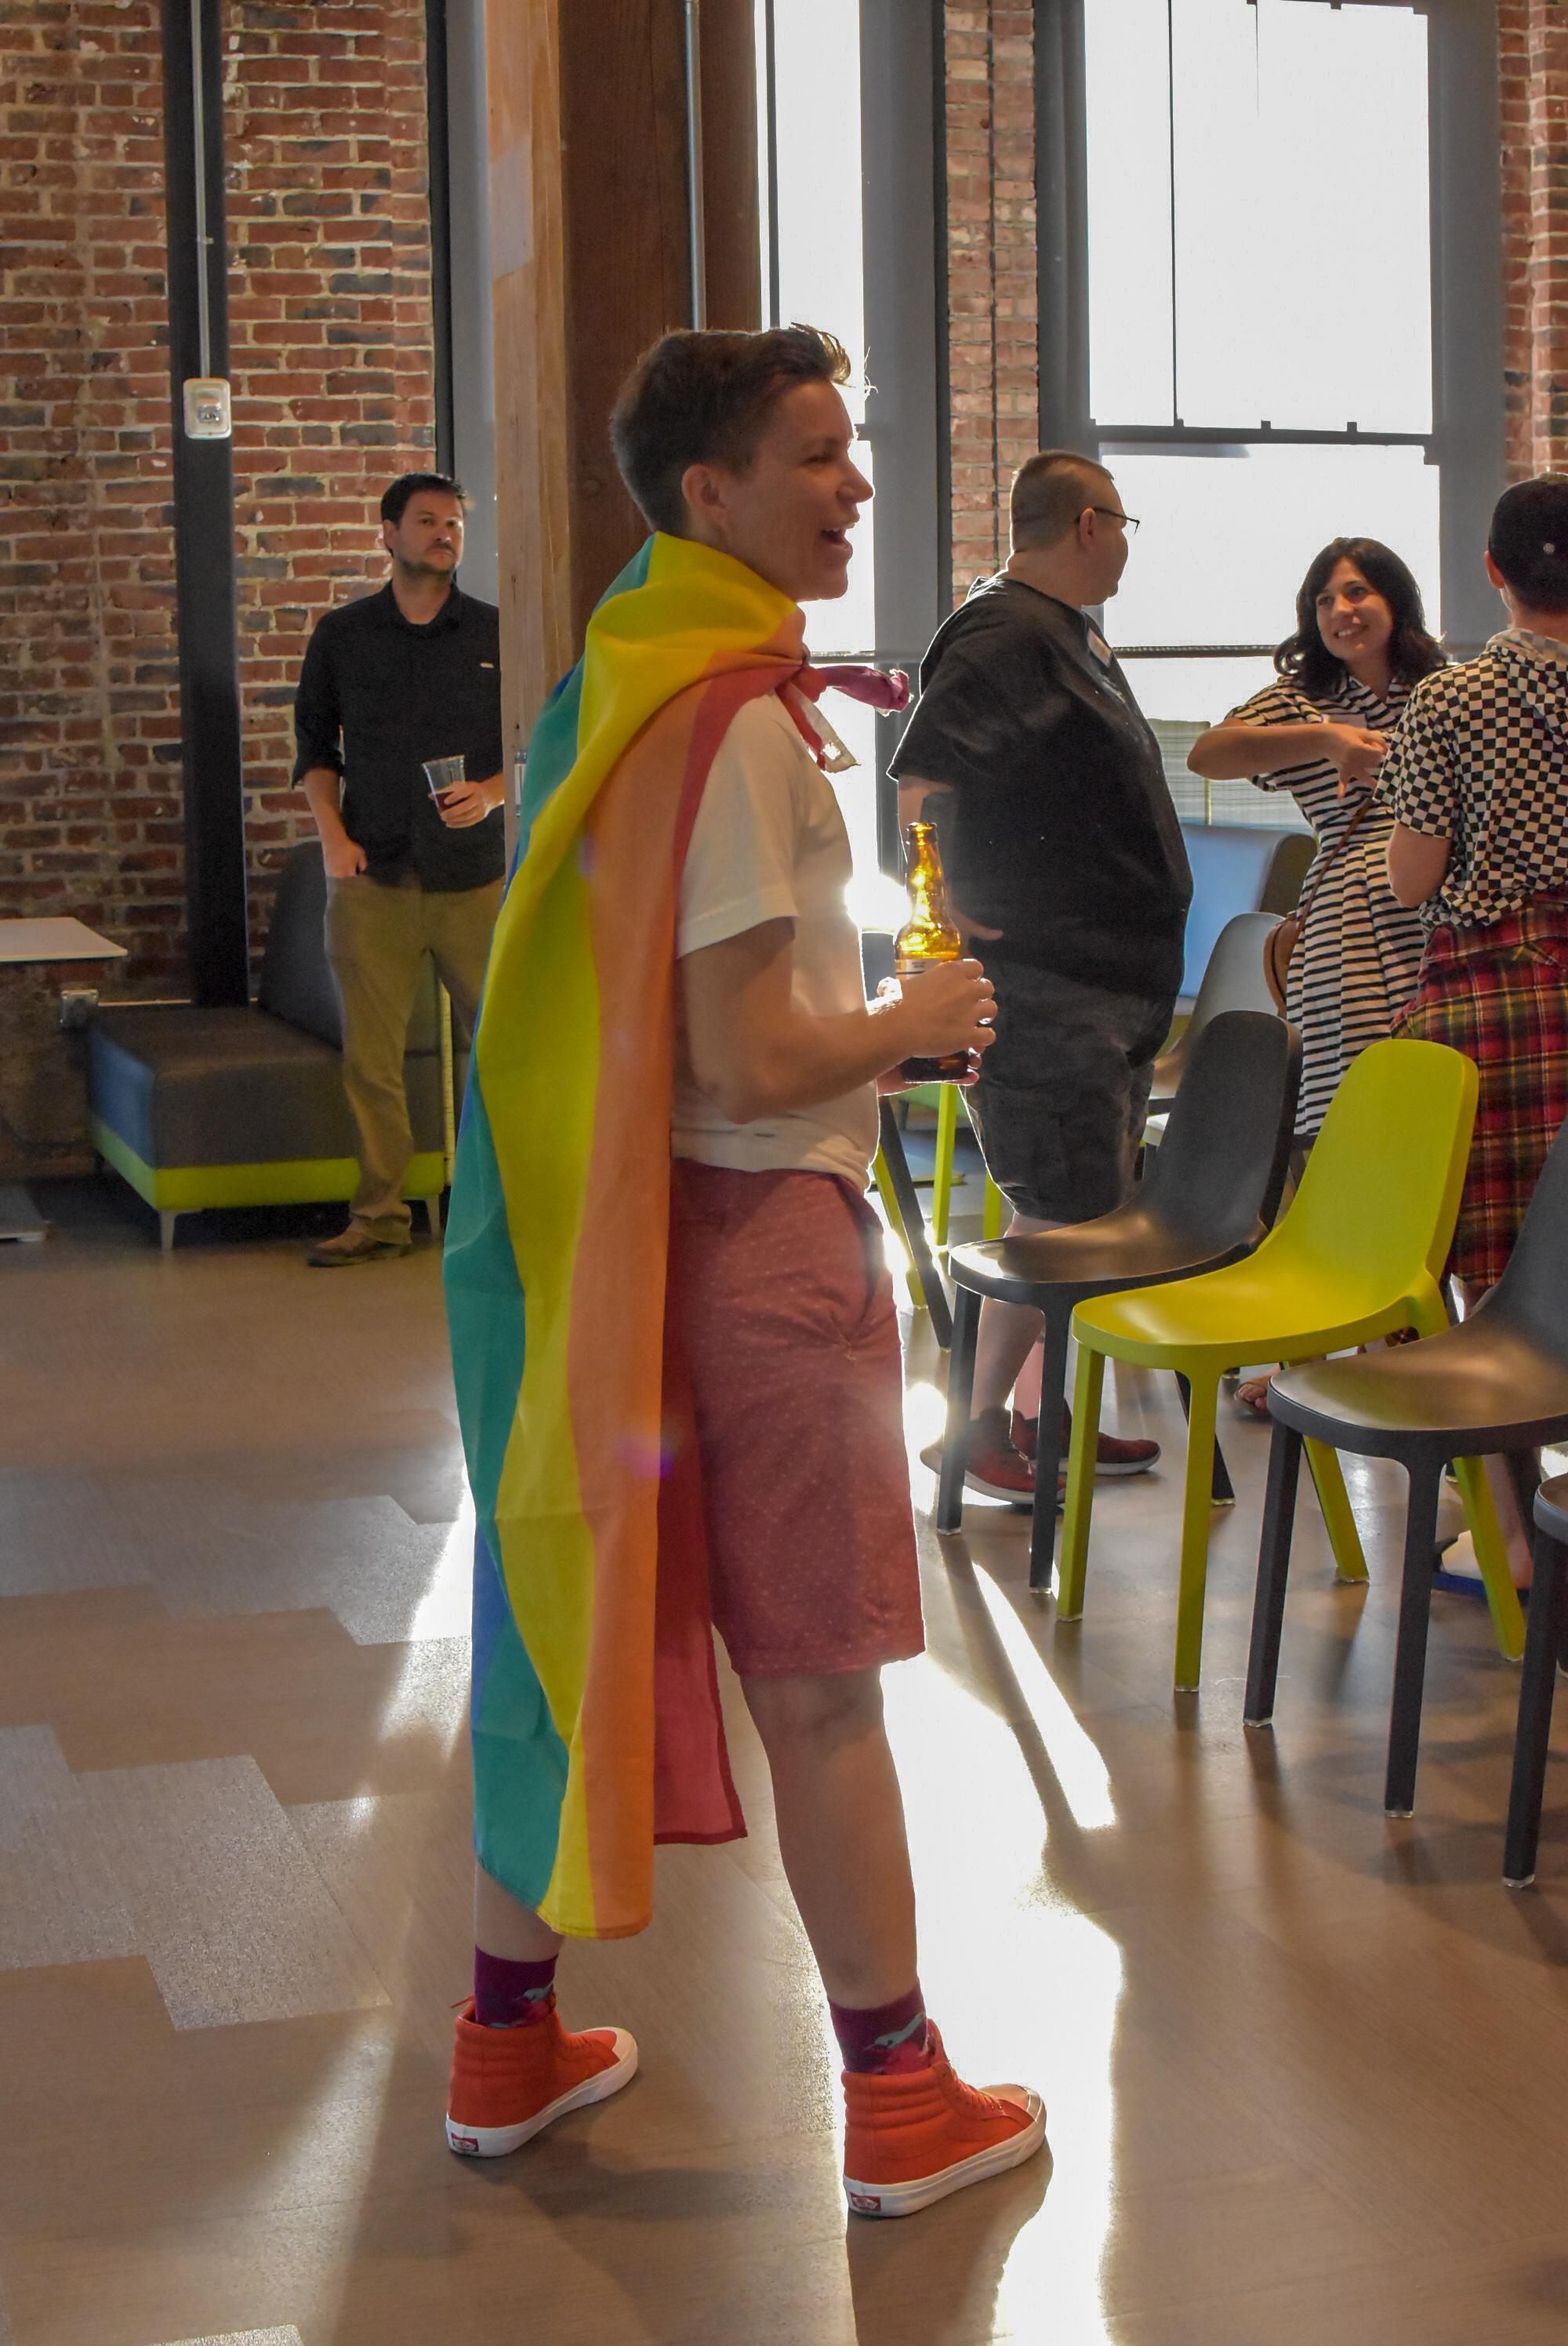 Perry_Eising-wearing-flag-cape.JPG